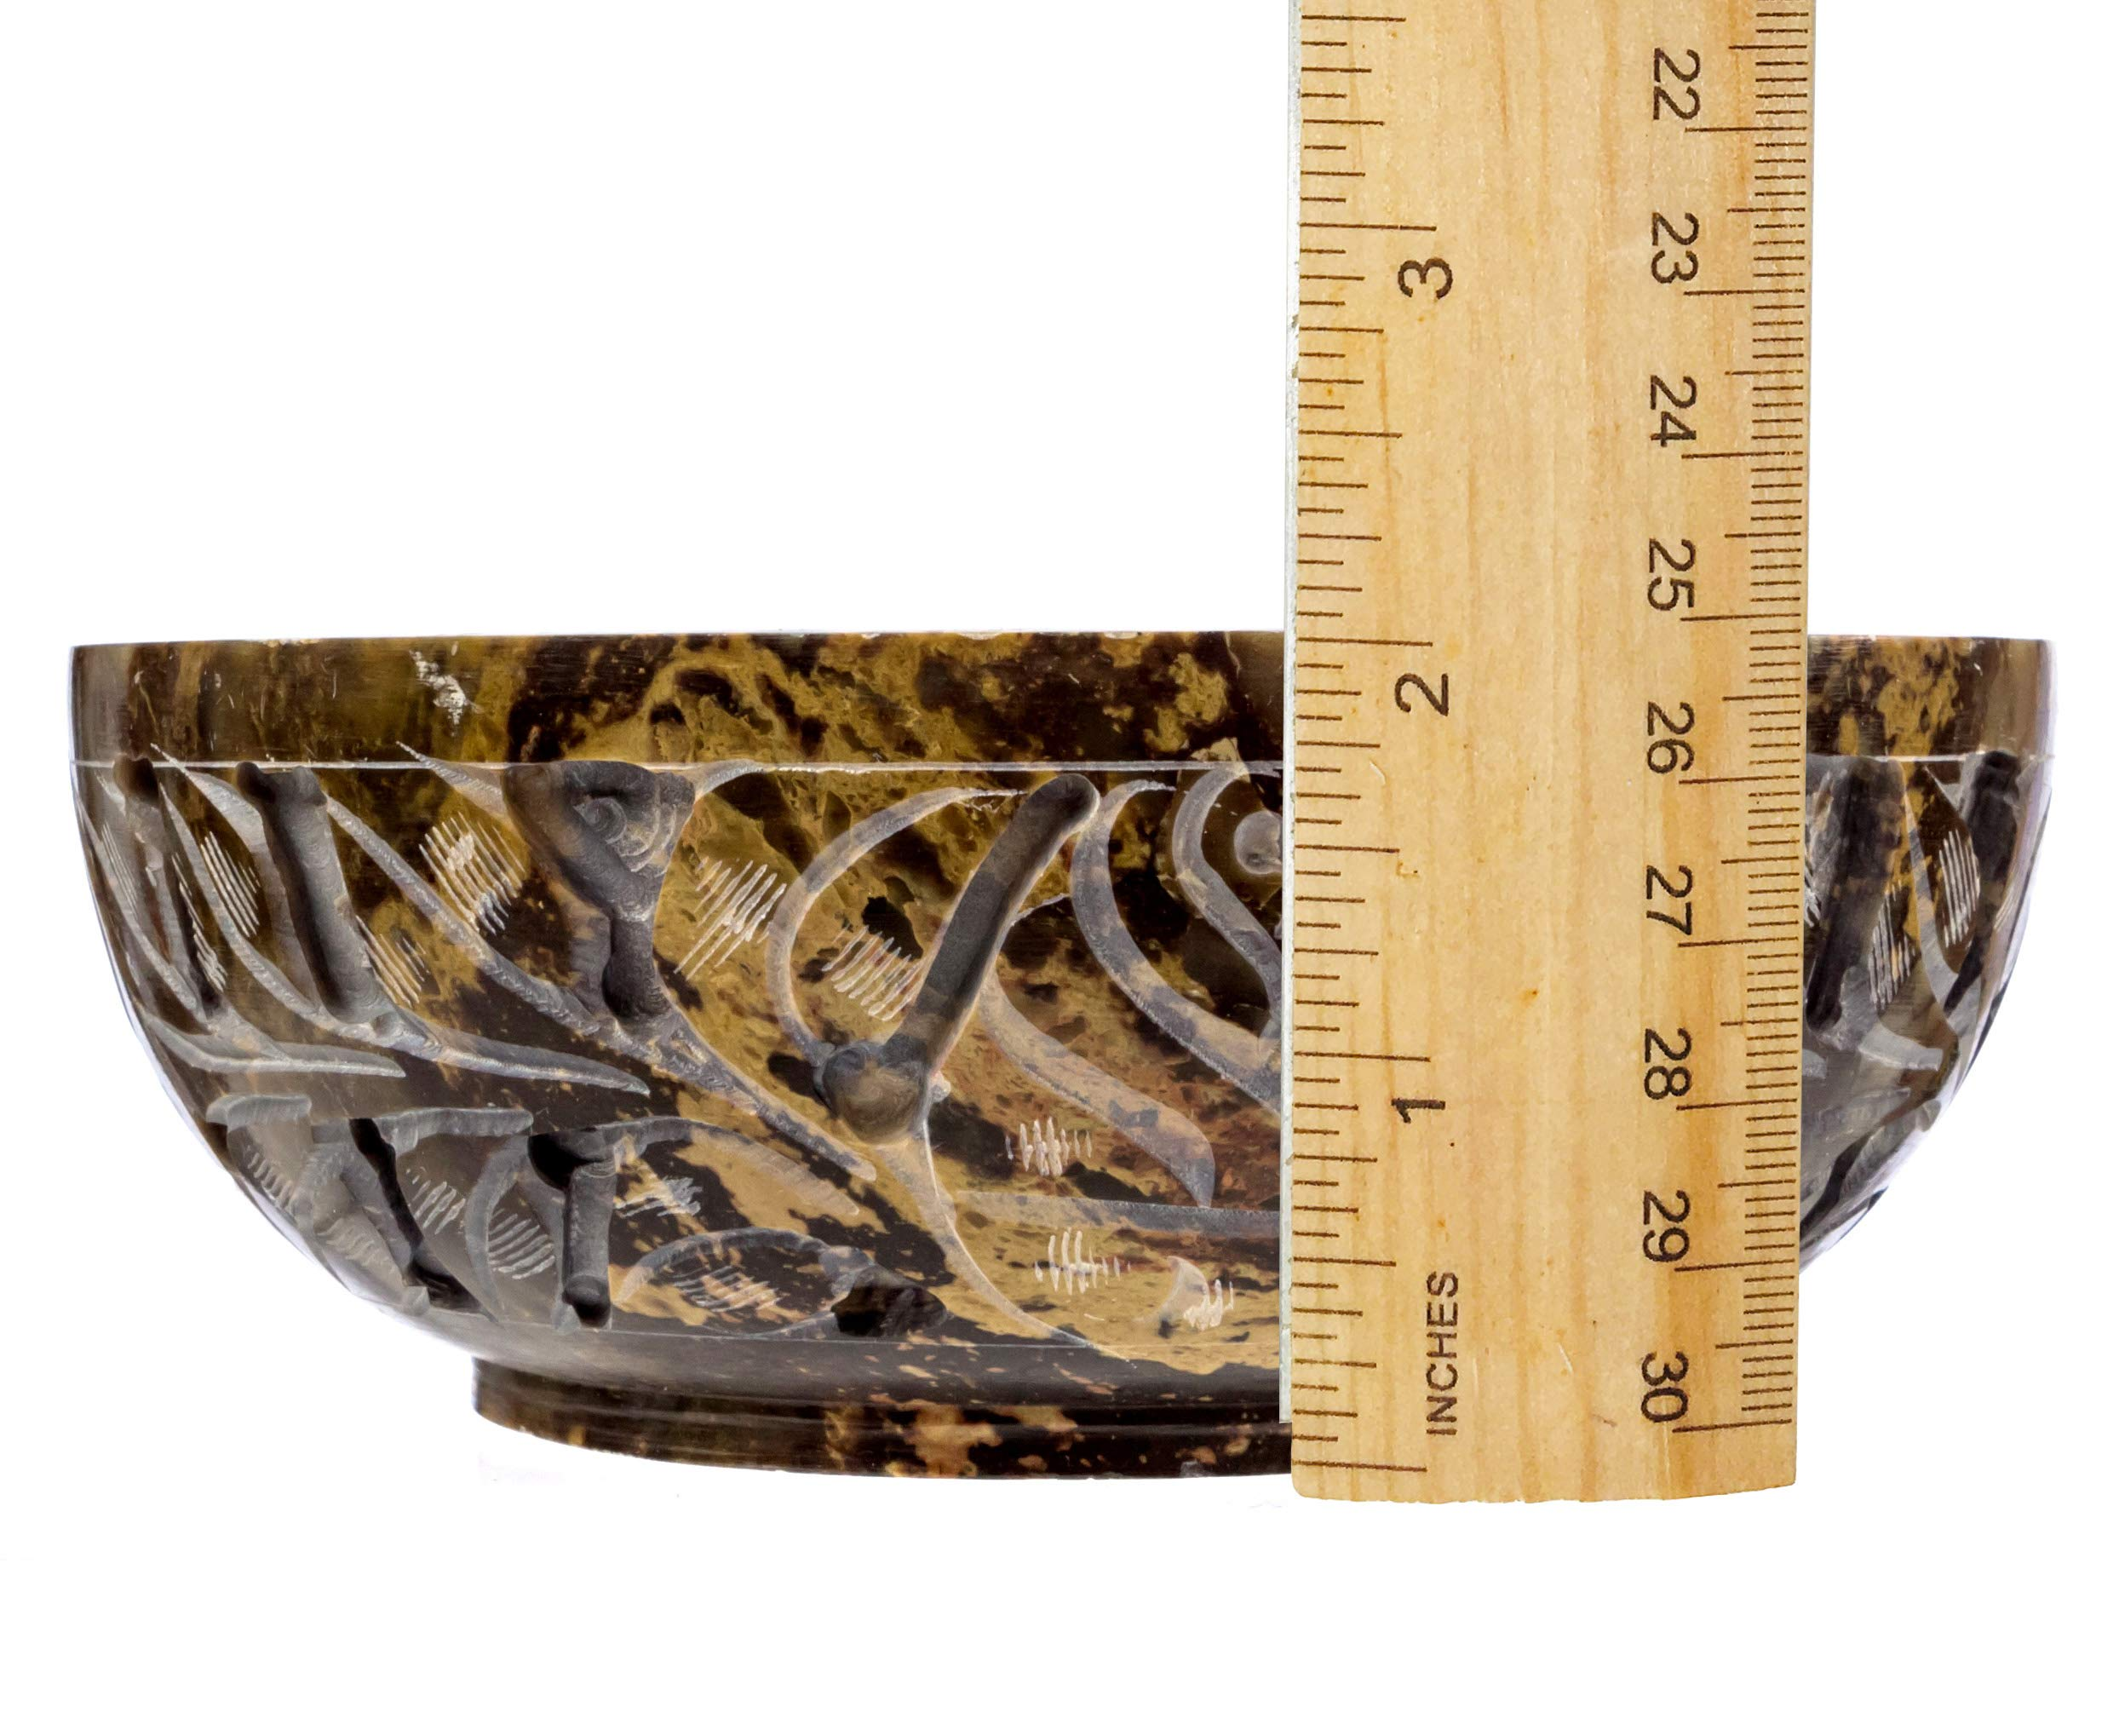 Alternative Imagination Soapstone Smudge Bowl Kit with 1 California White Sage Smudge Stick, 2 Palo Santo Smudge Sticks, and 1/2 lb of White Sand (Deluxe) by Alternative Imagination (Image #8)